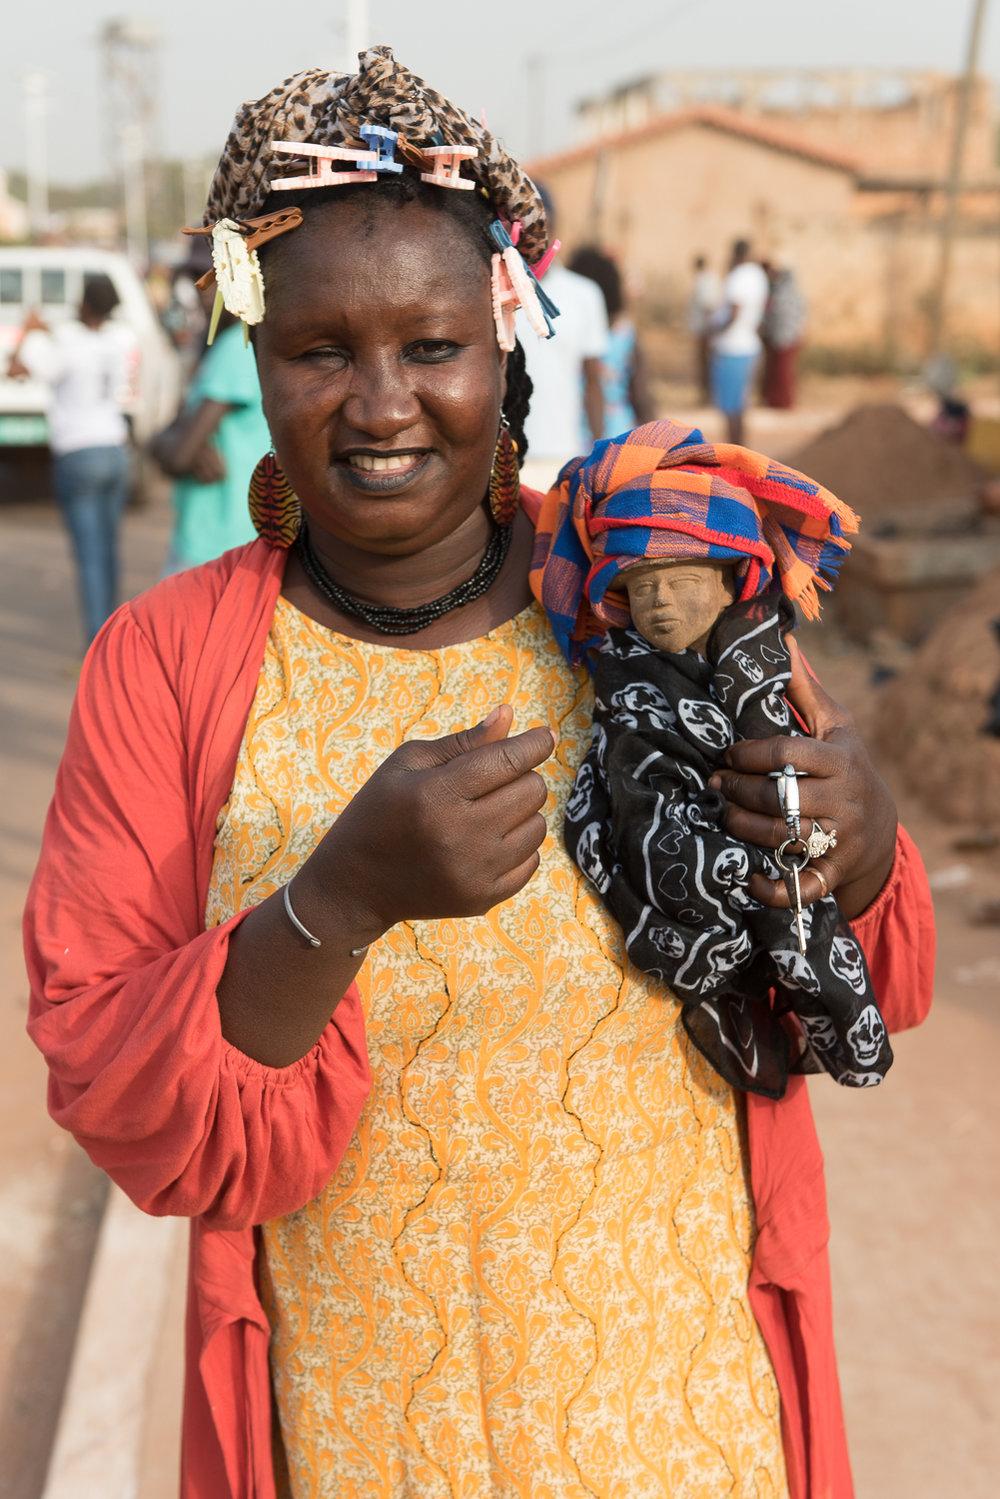 2018_02_Guinea-Bissau_Carnaval_Antula_Portraits_0084.jpg